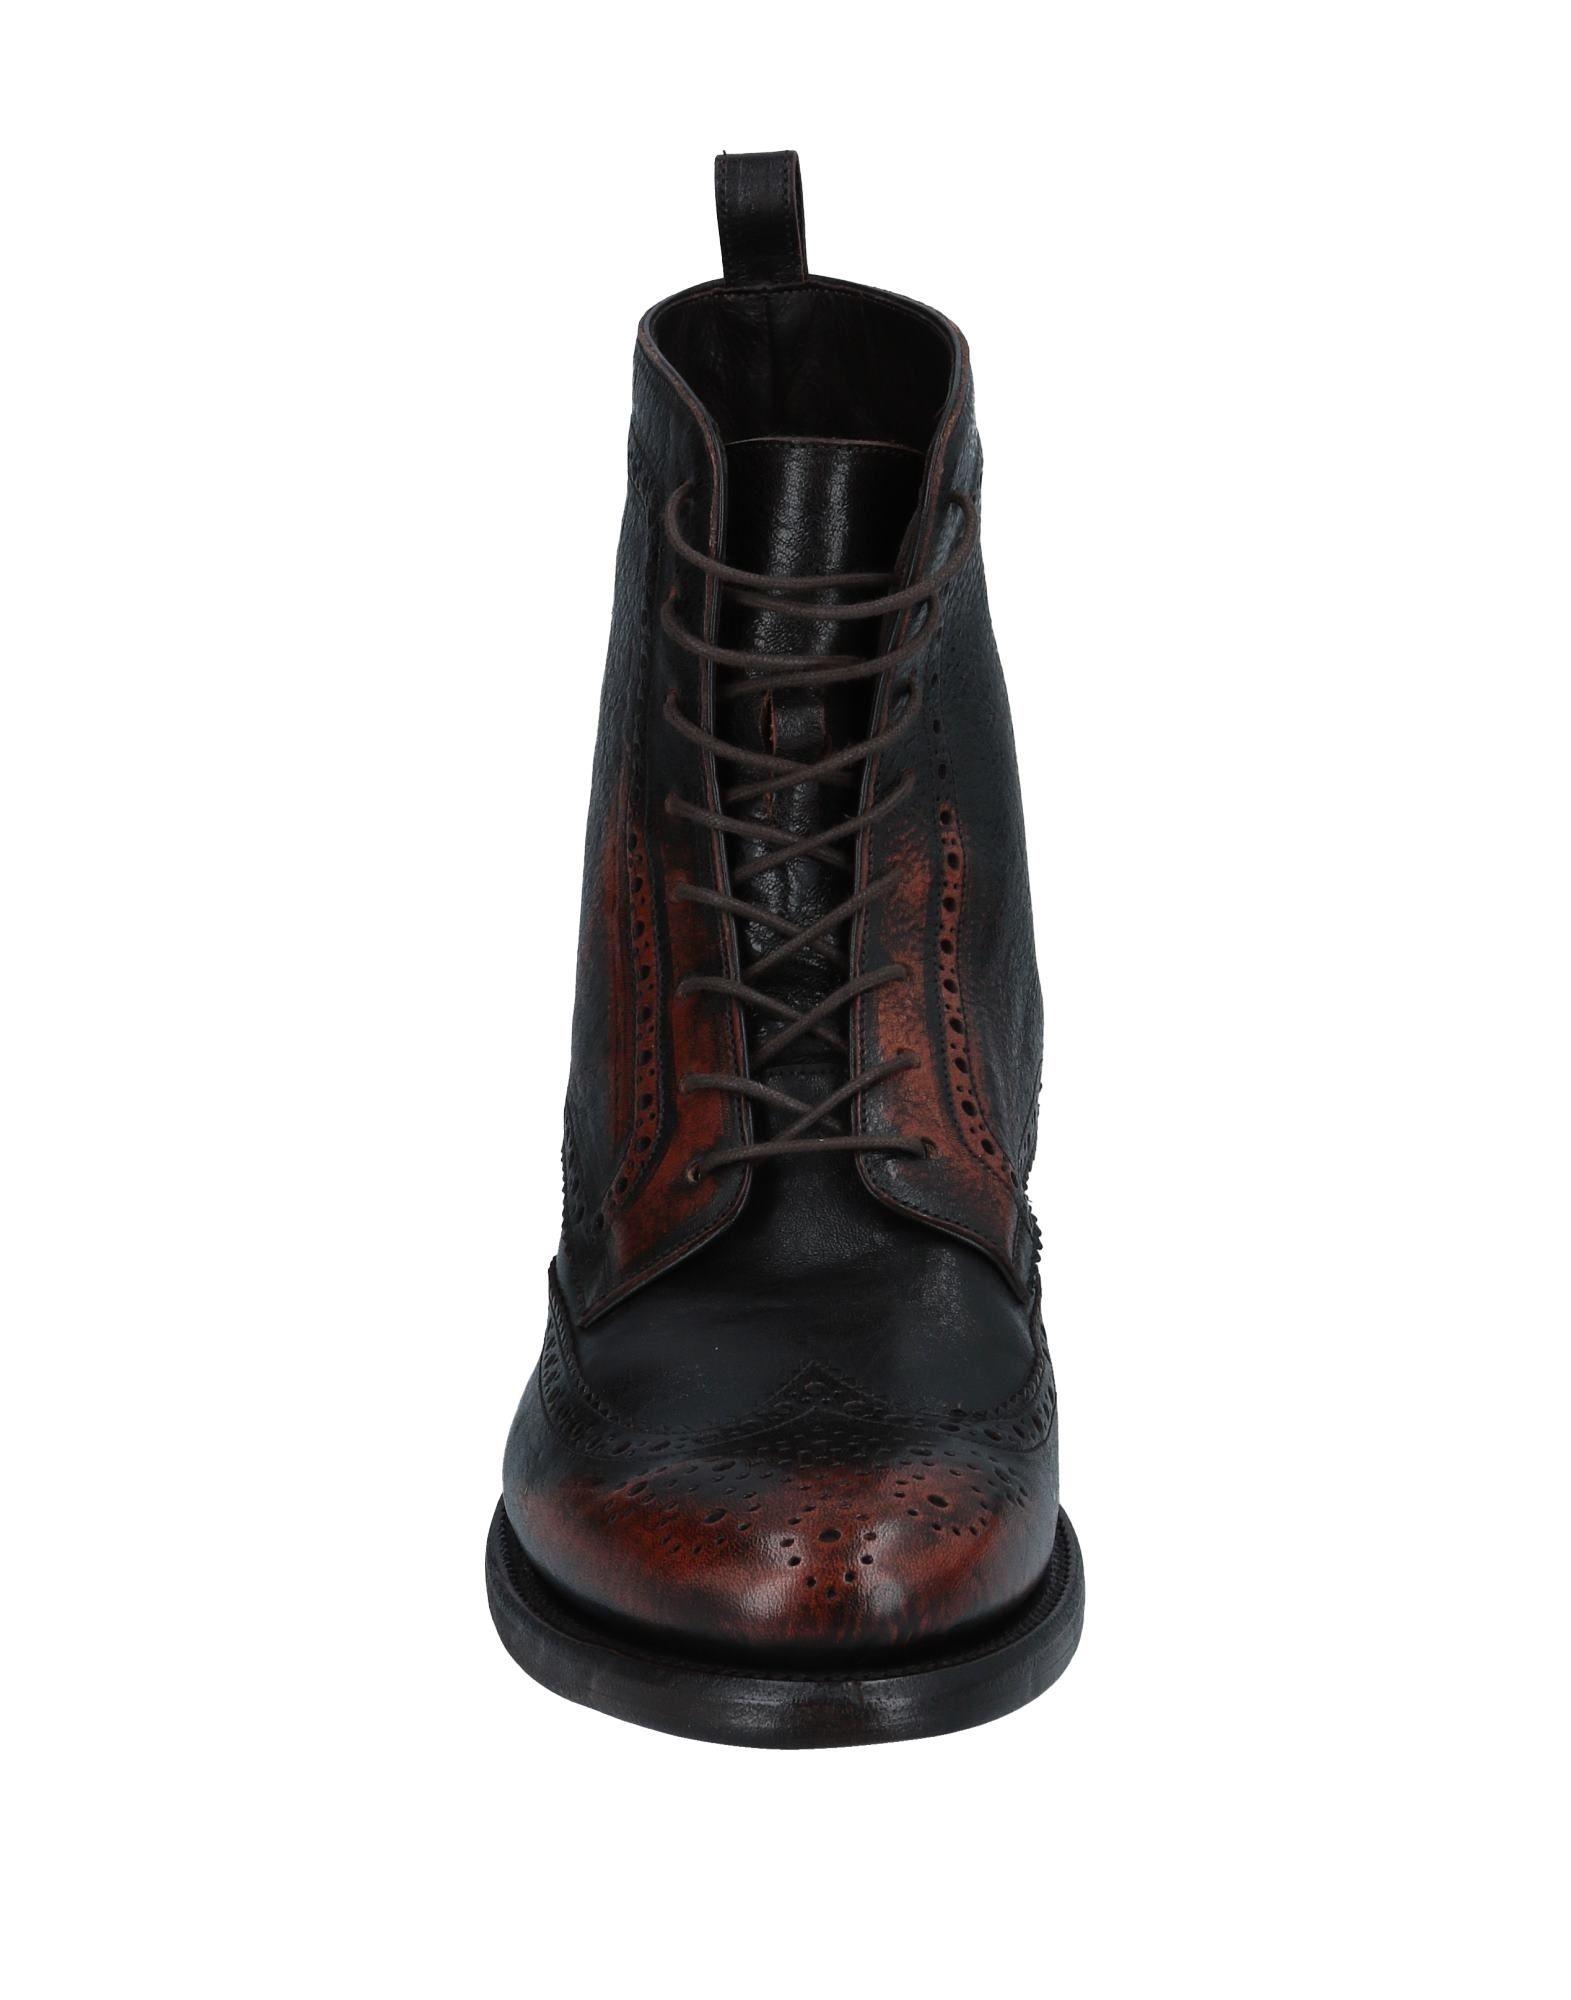 Ortigni Boots  - Men Ortigni Boots online on  Boots Australia - 11546866BN 5db86a